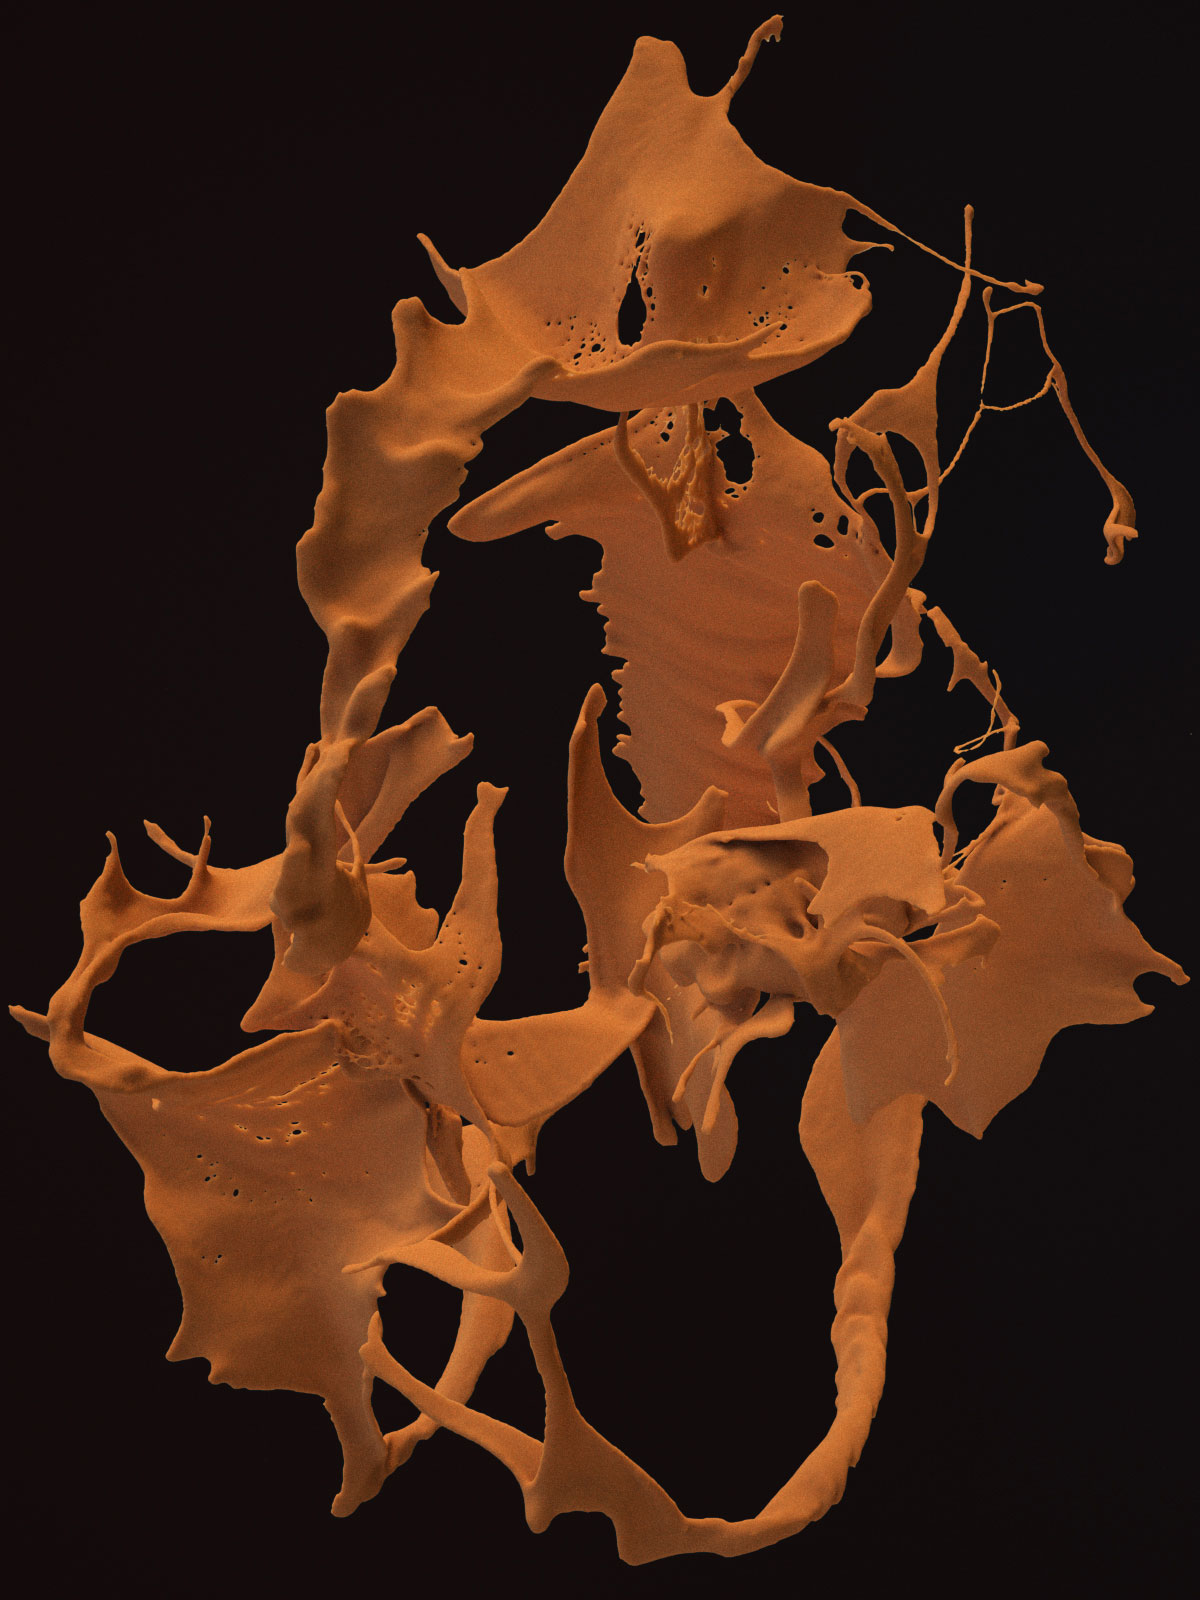 Postpainting II 05, CGI Fine Art Print, 155 x 118 cm, 2013